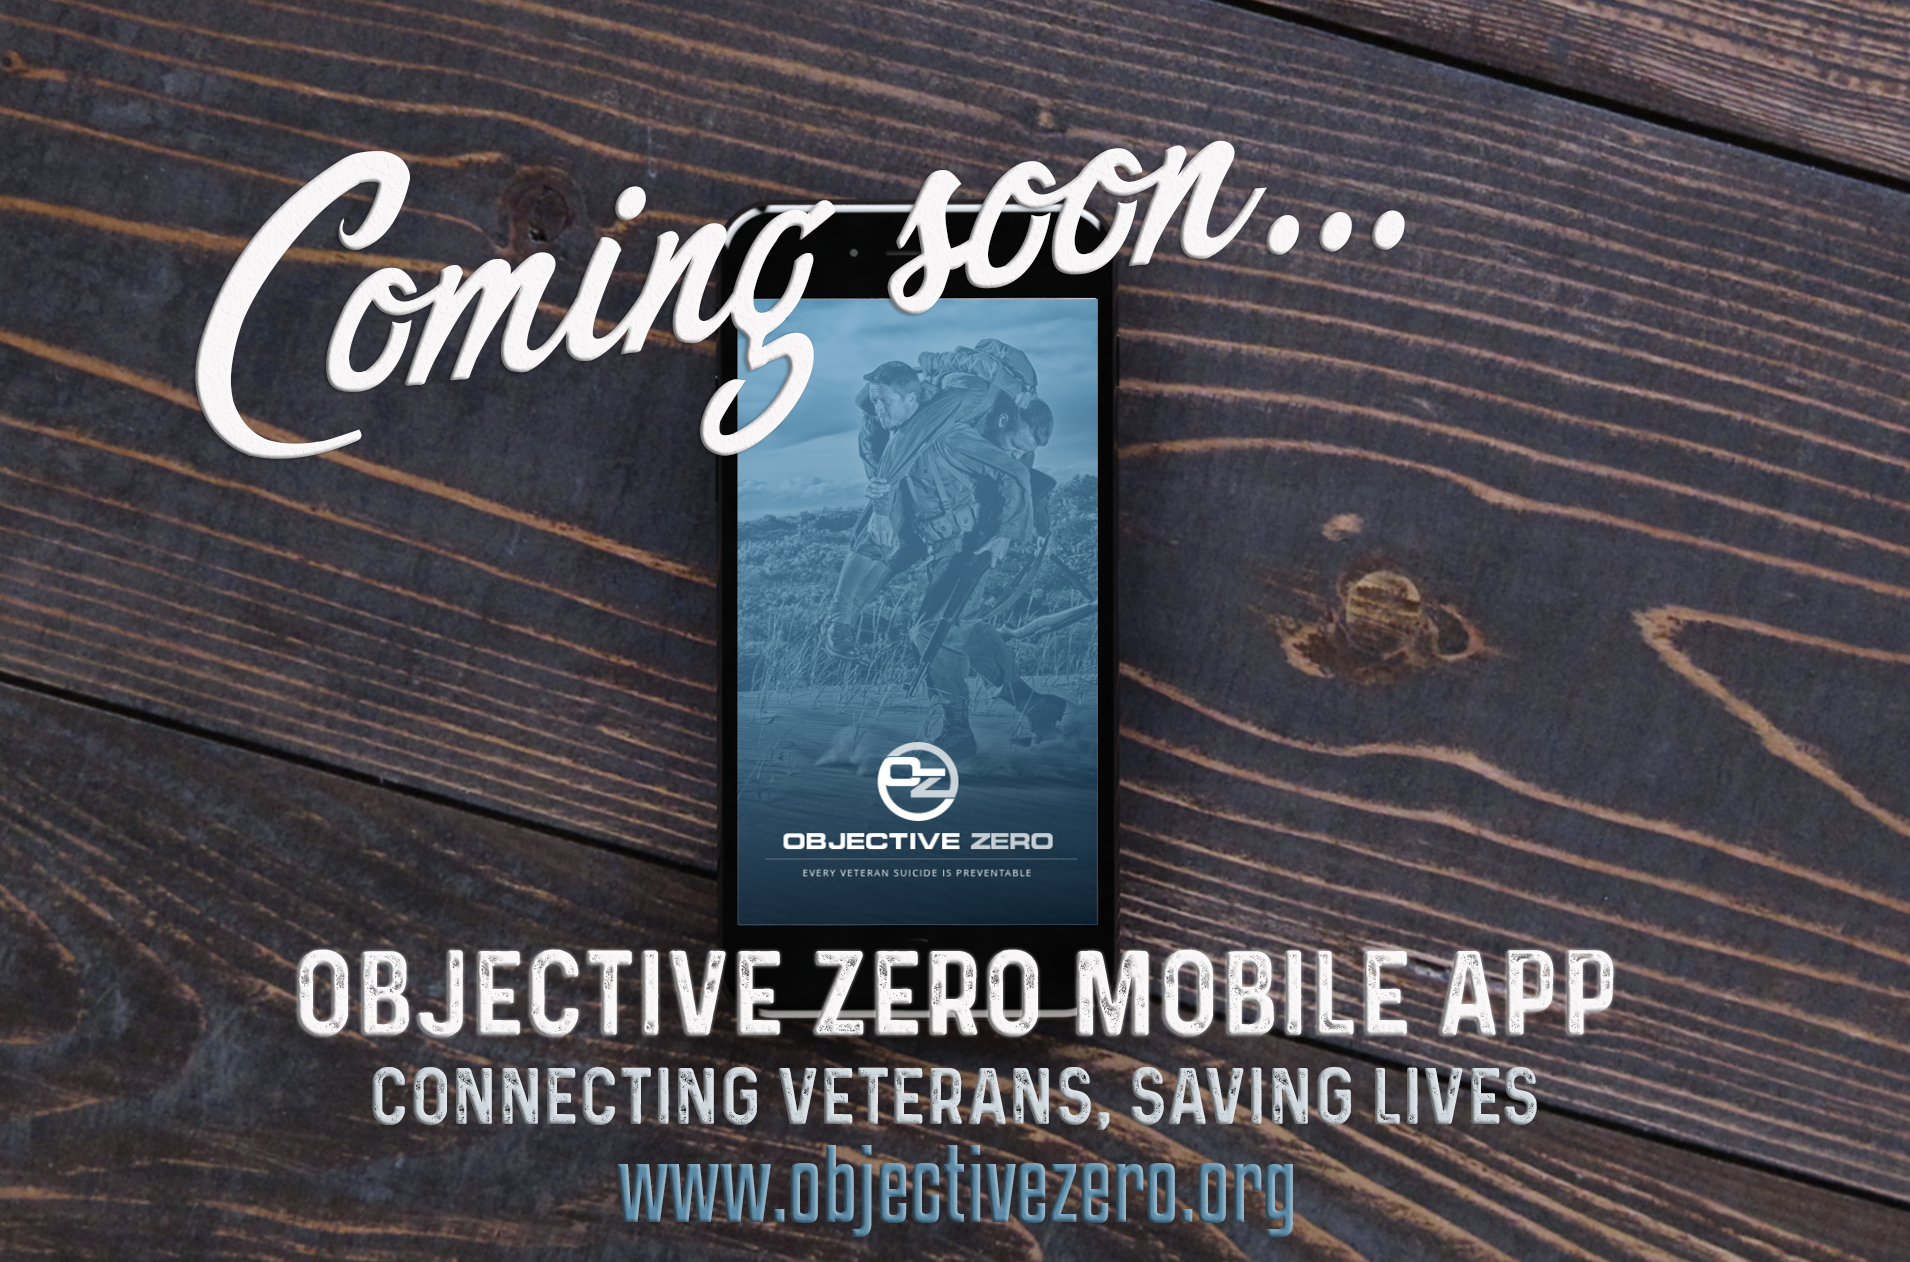 'Objective Zero' App Aims To Prevent Veteran Suicide